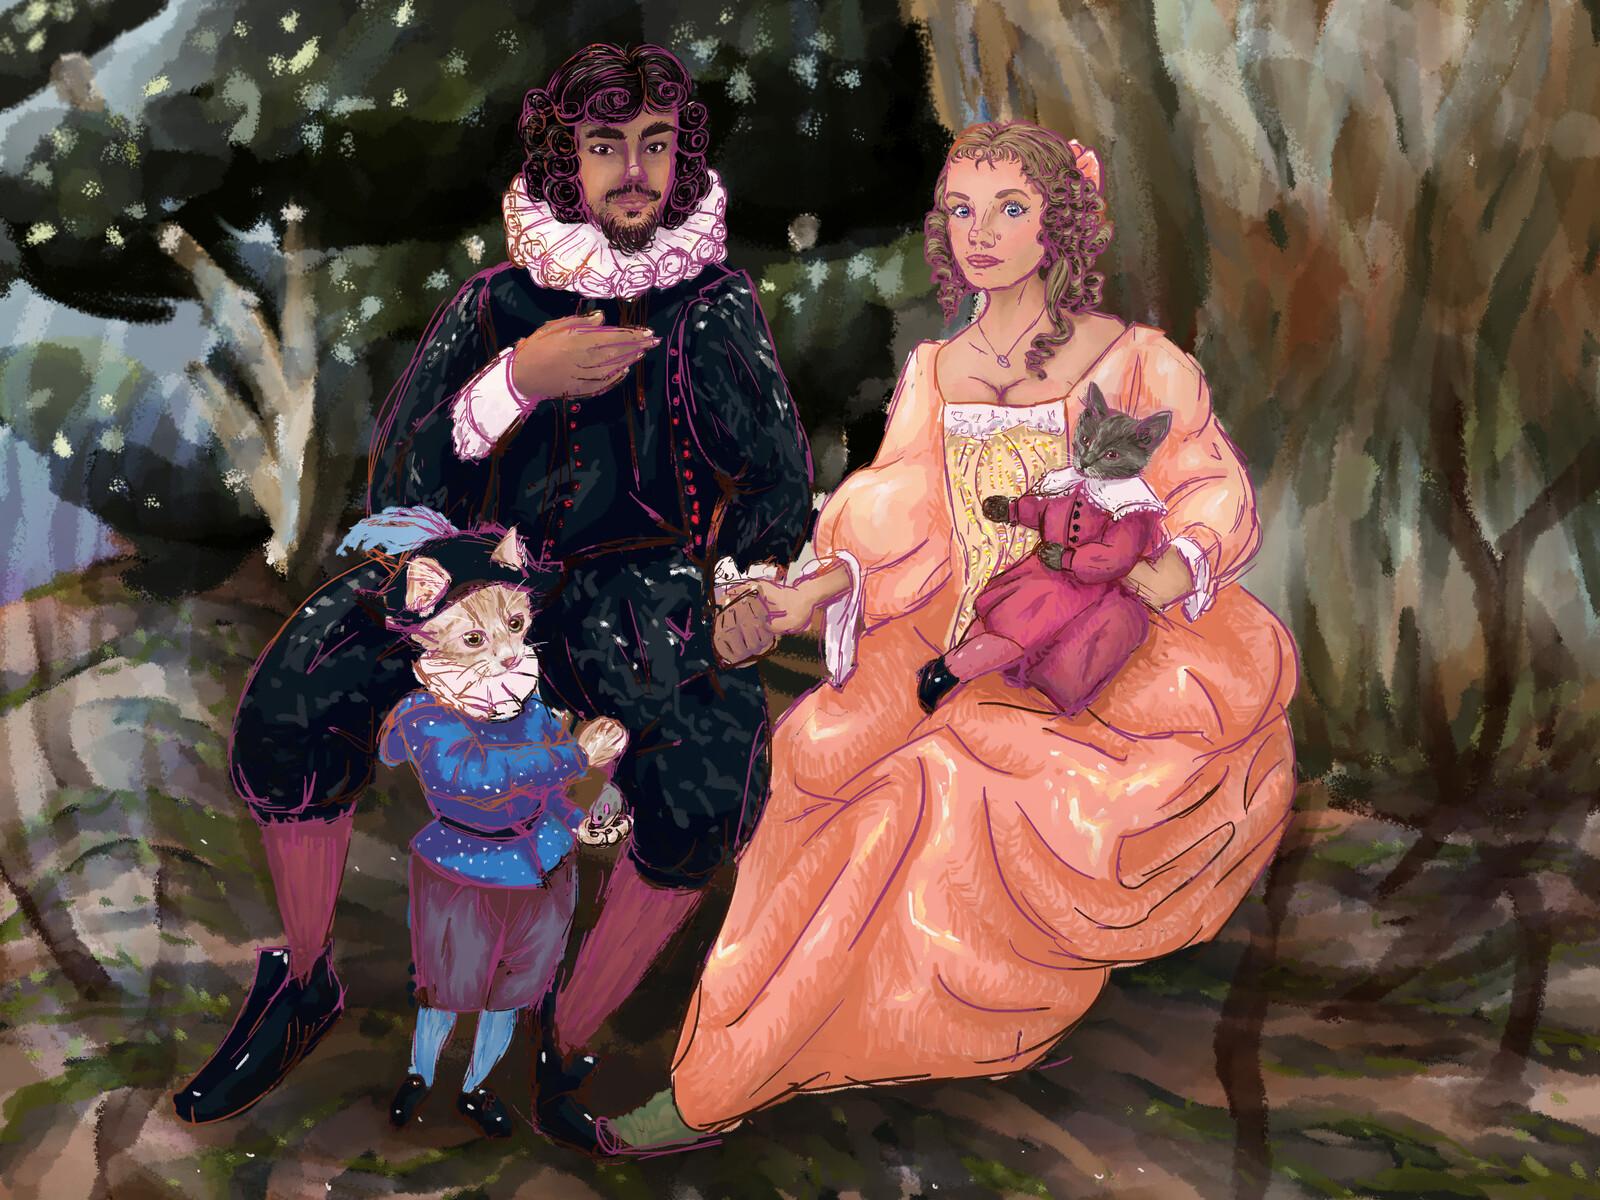 Family Portrait in 1650s Dutch Style